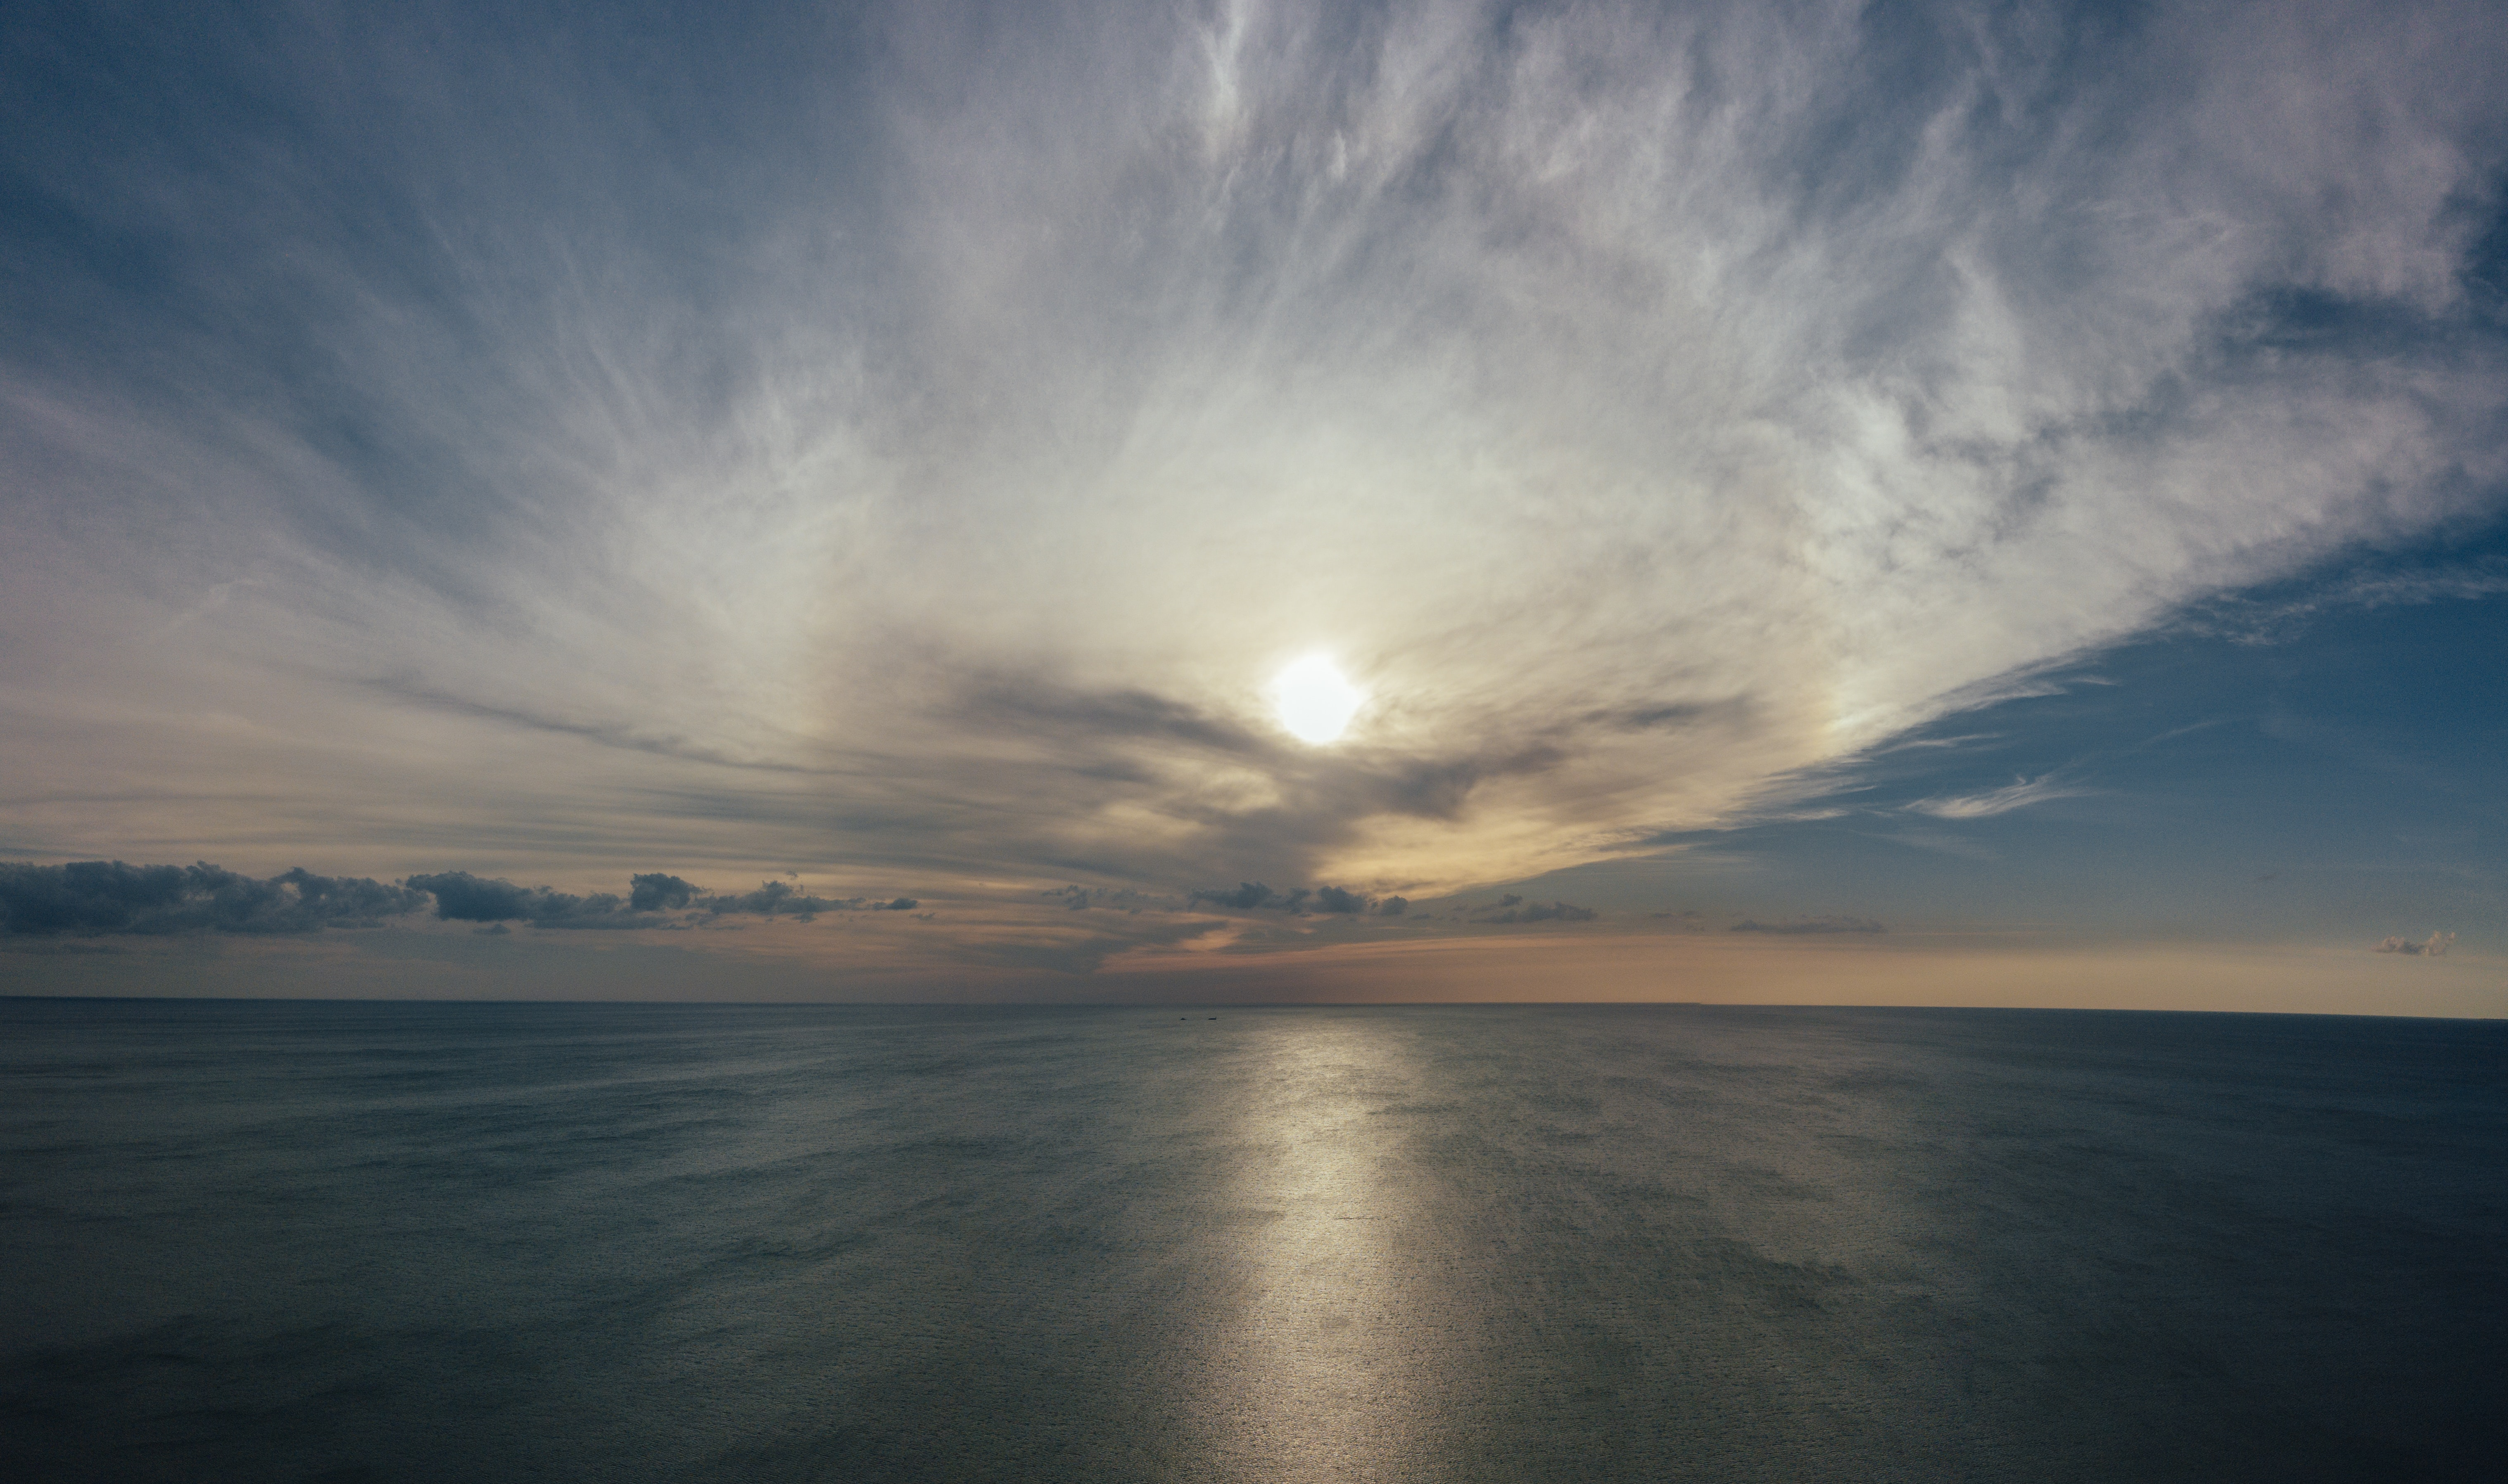 Bird's eye view of ocean photo